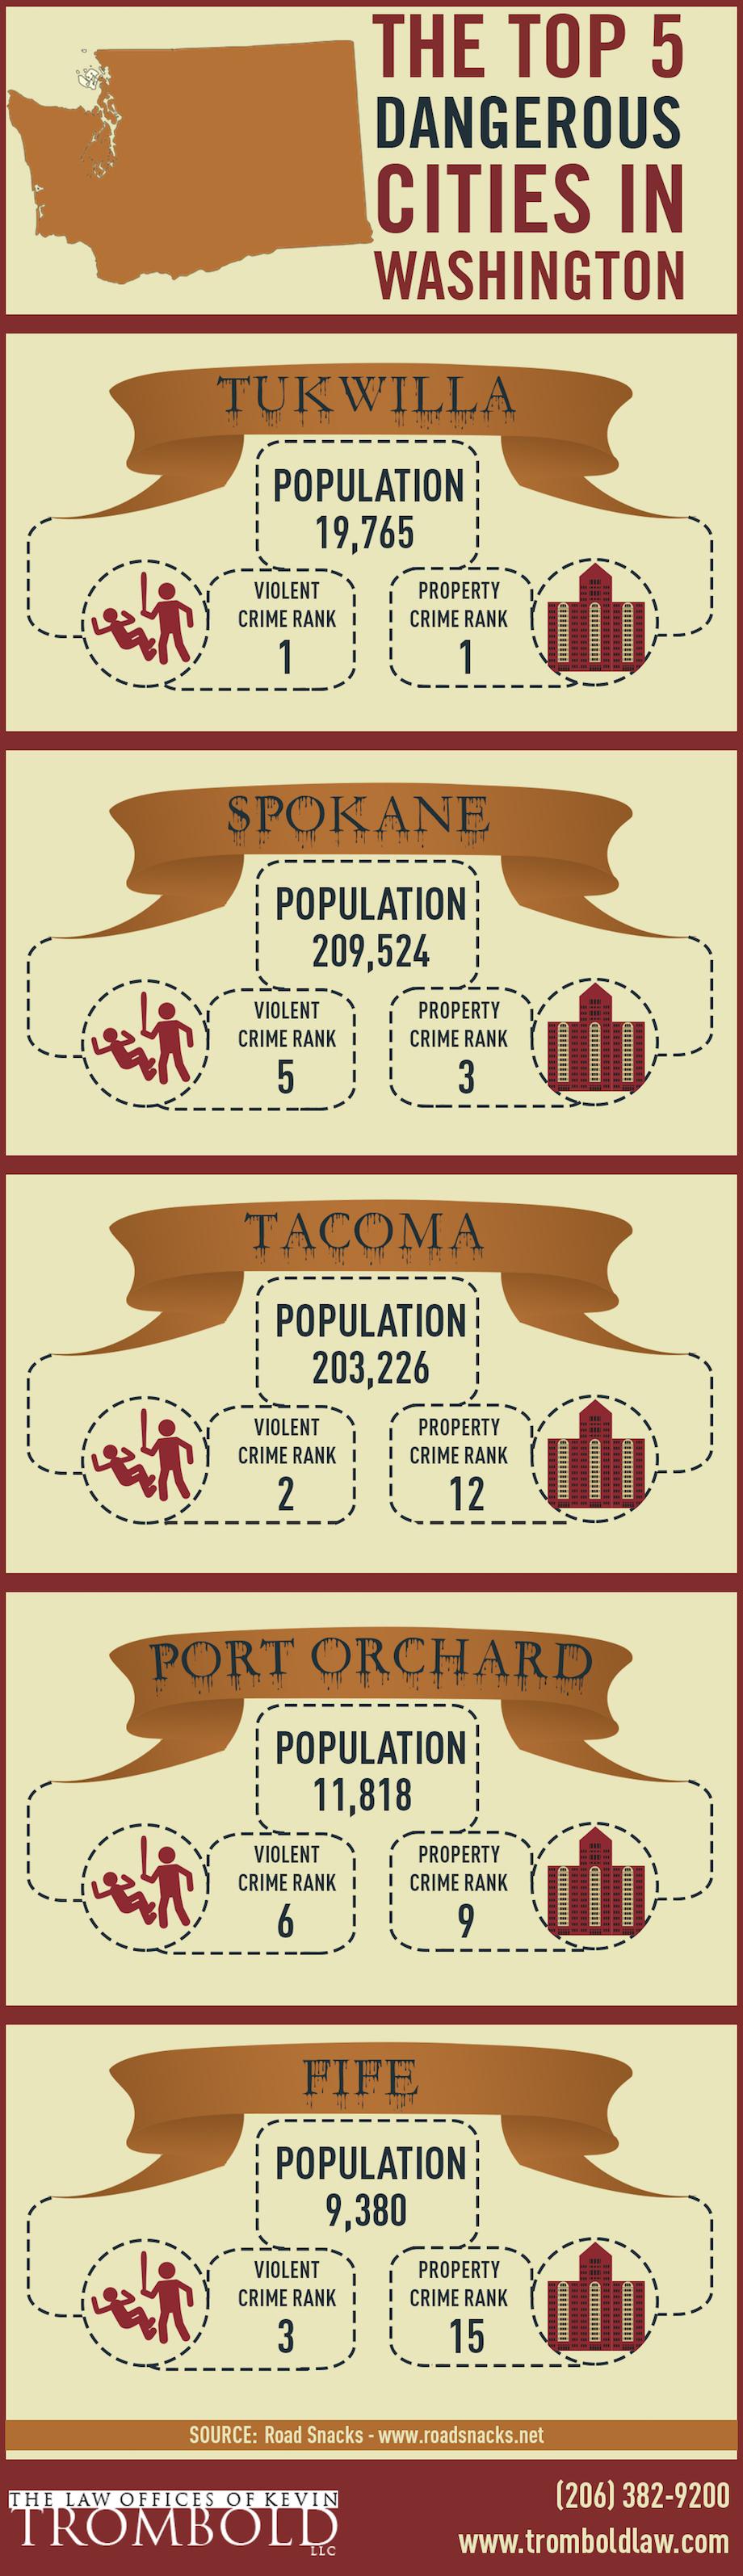 The Top 5 Dangerous Cities In Washington